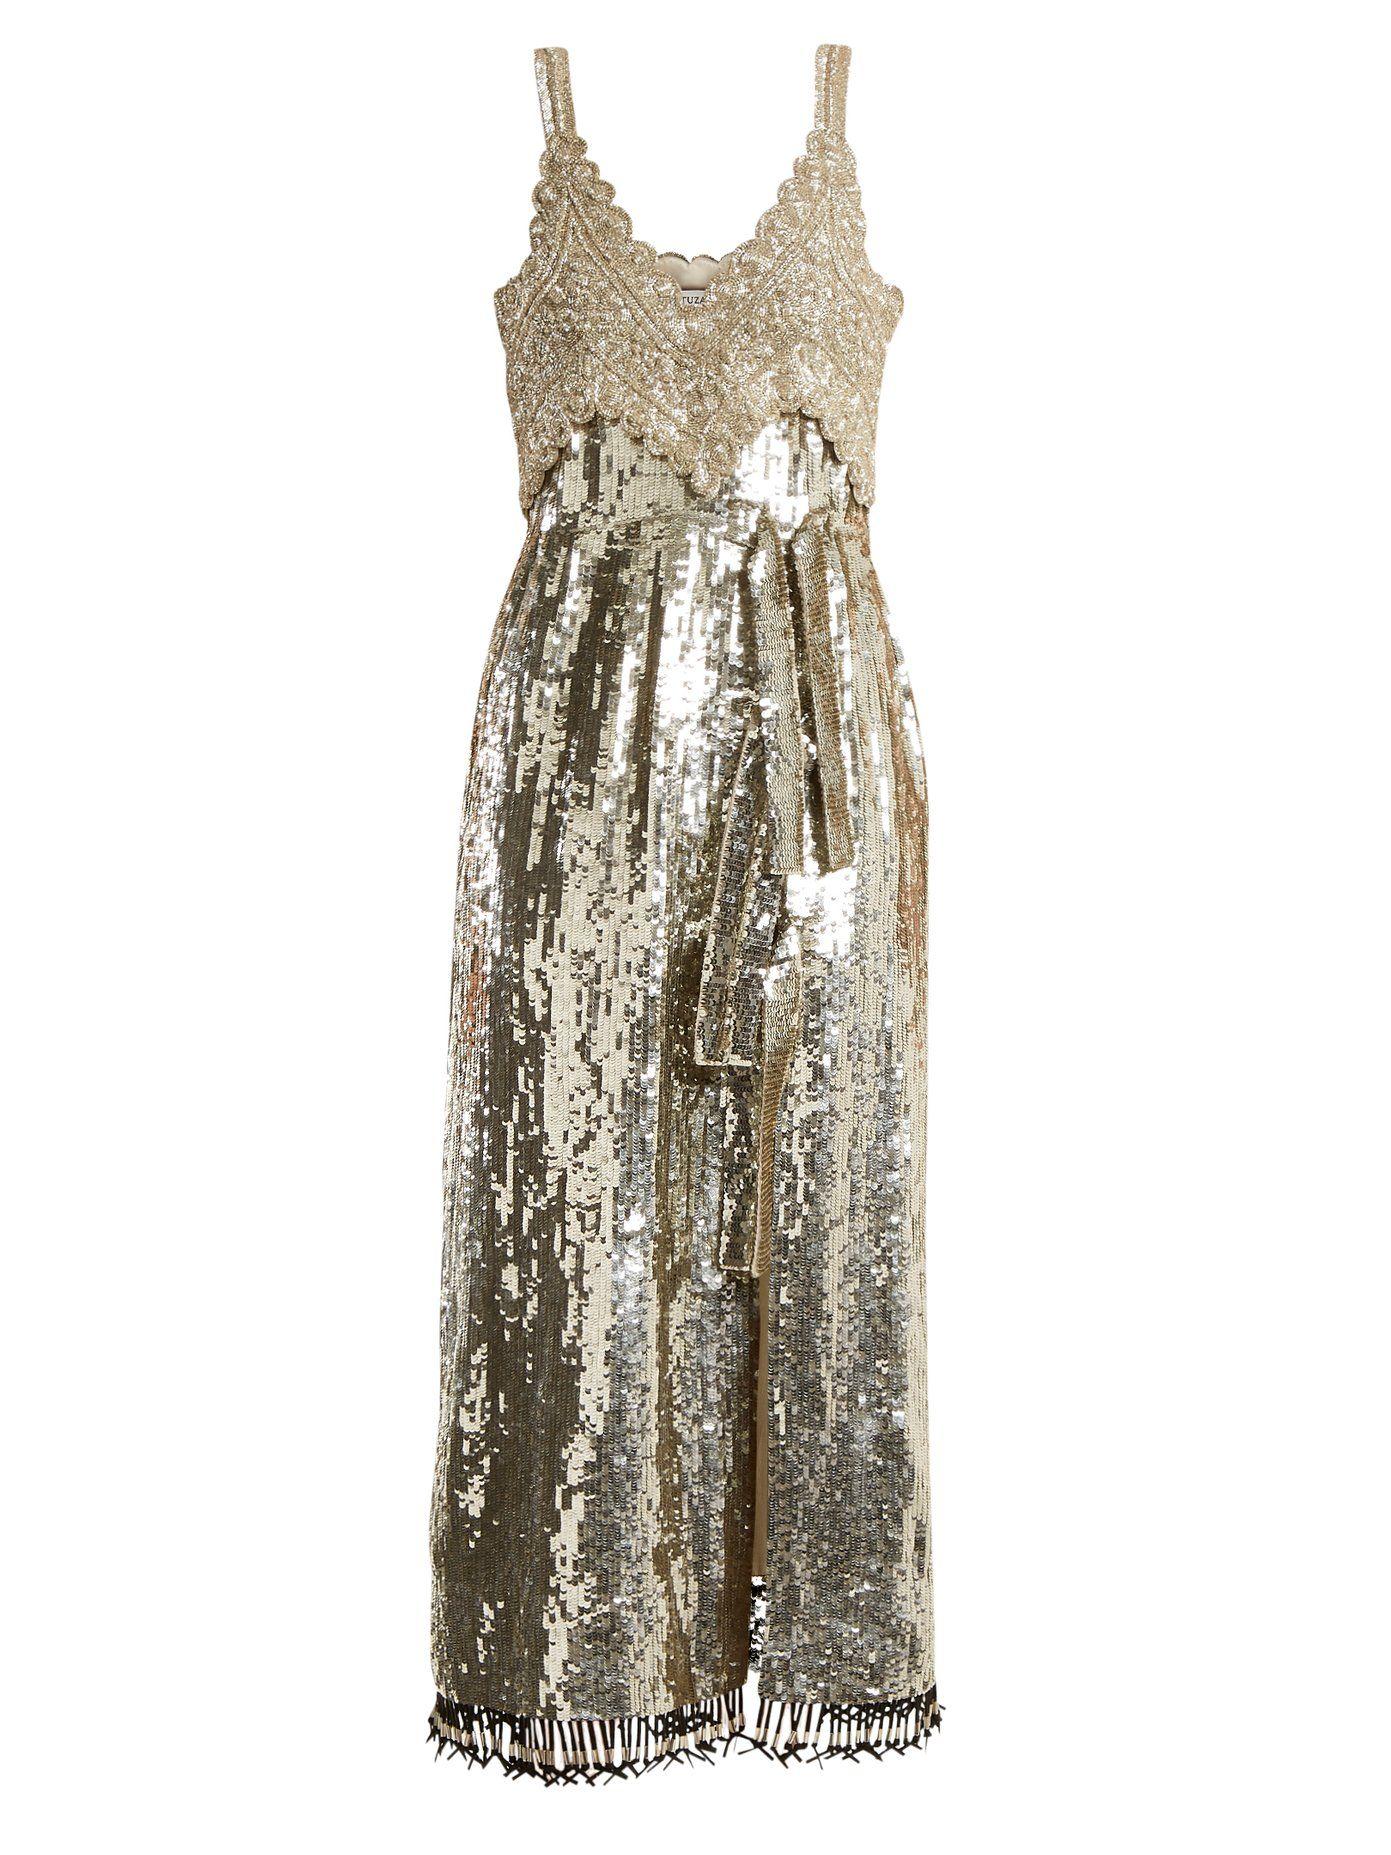 Elan sequin and bead-embellished silk dress Altuzarra Visit Online Discount Low Cost Big Sale For Sale With Mastercard Sale Online RStqP5